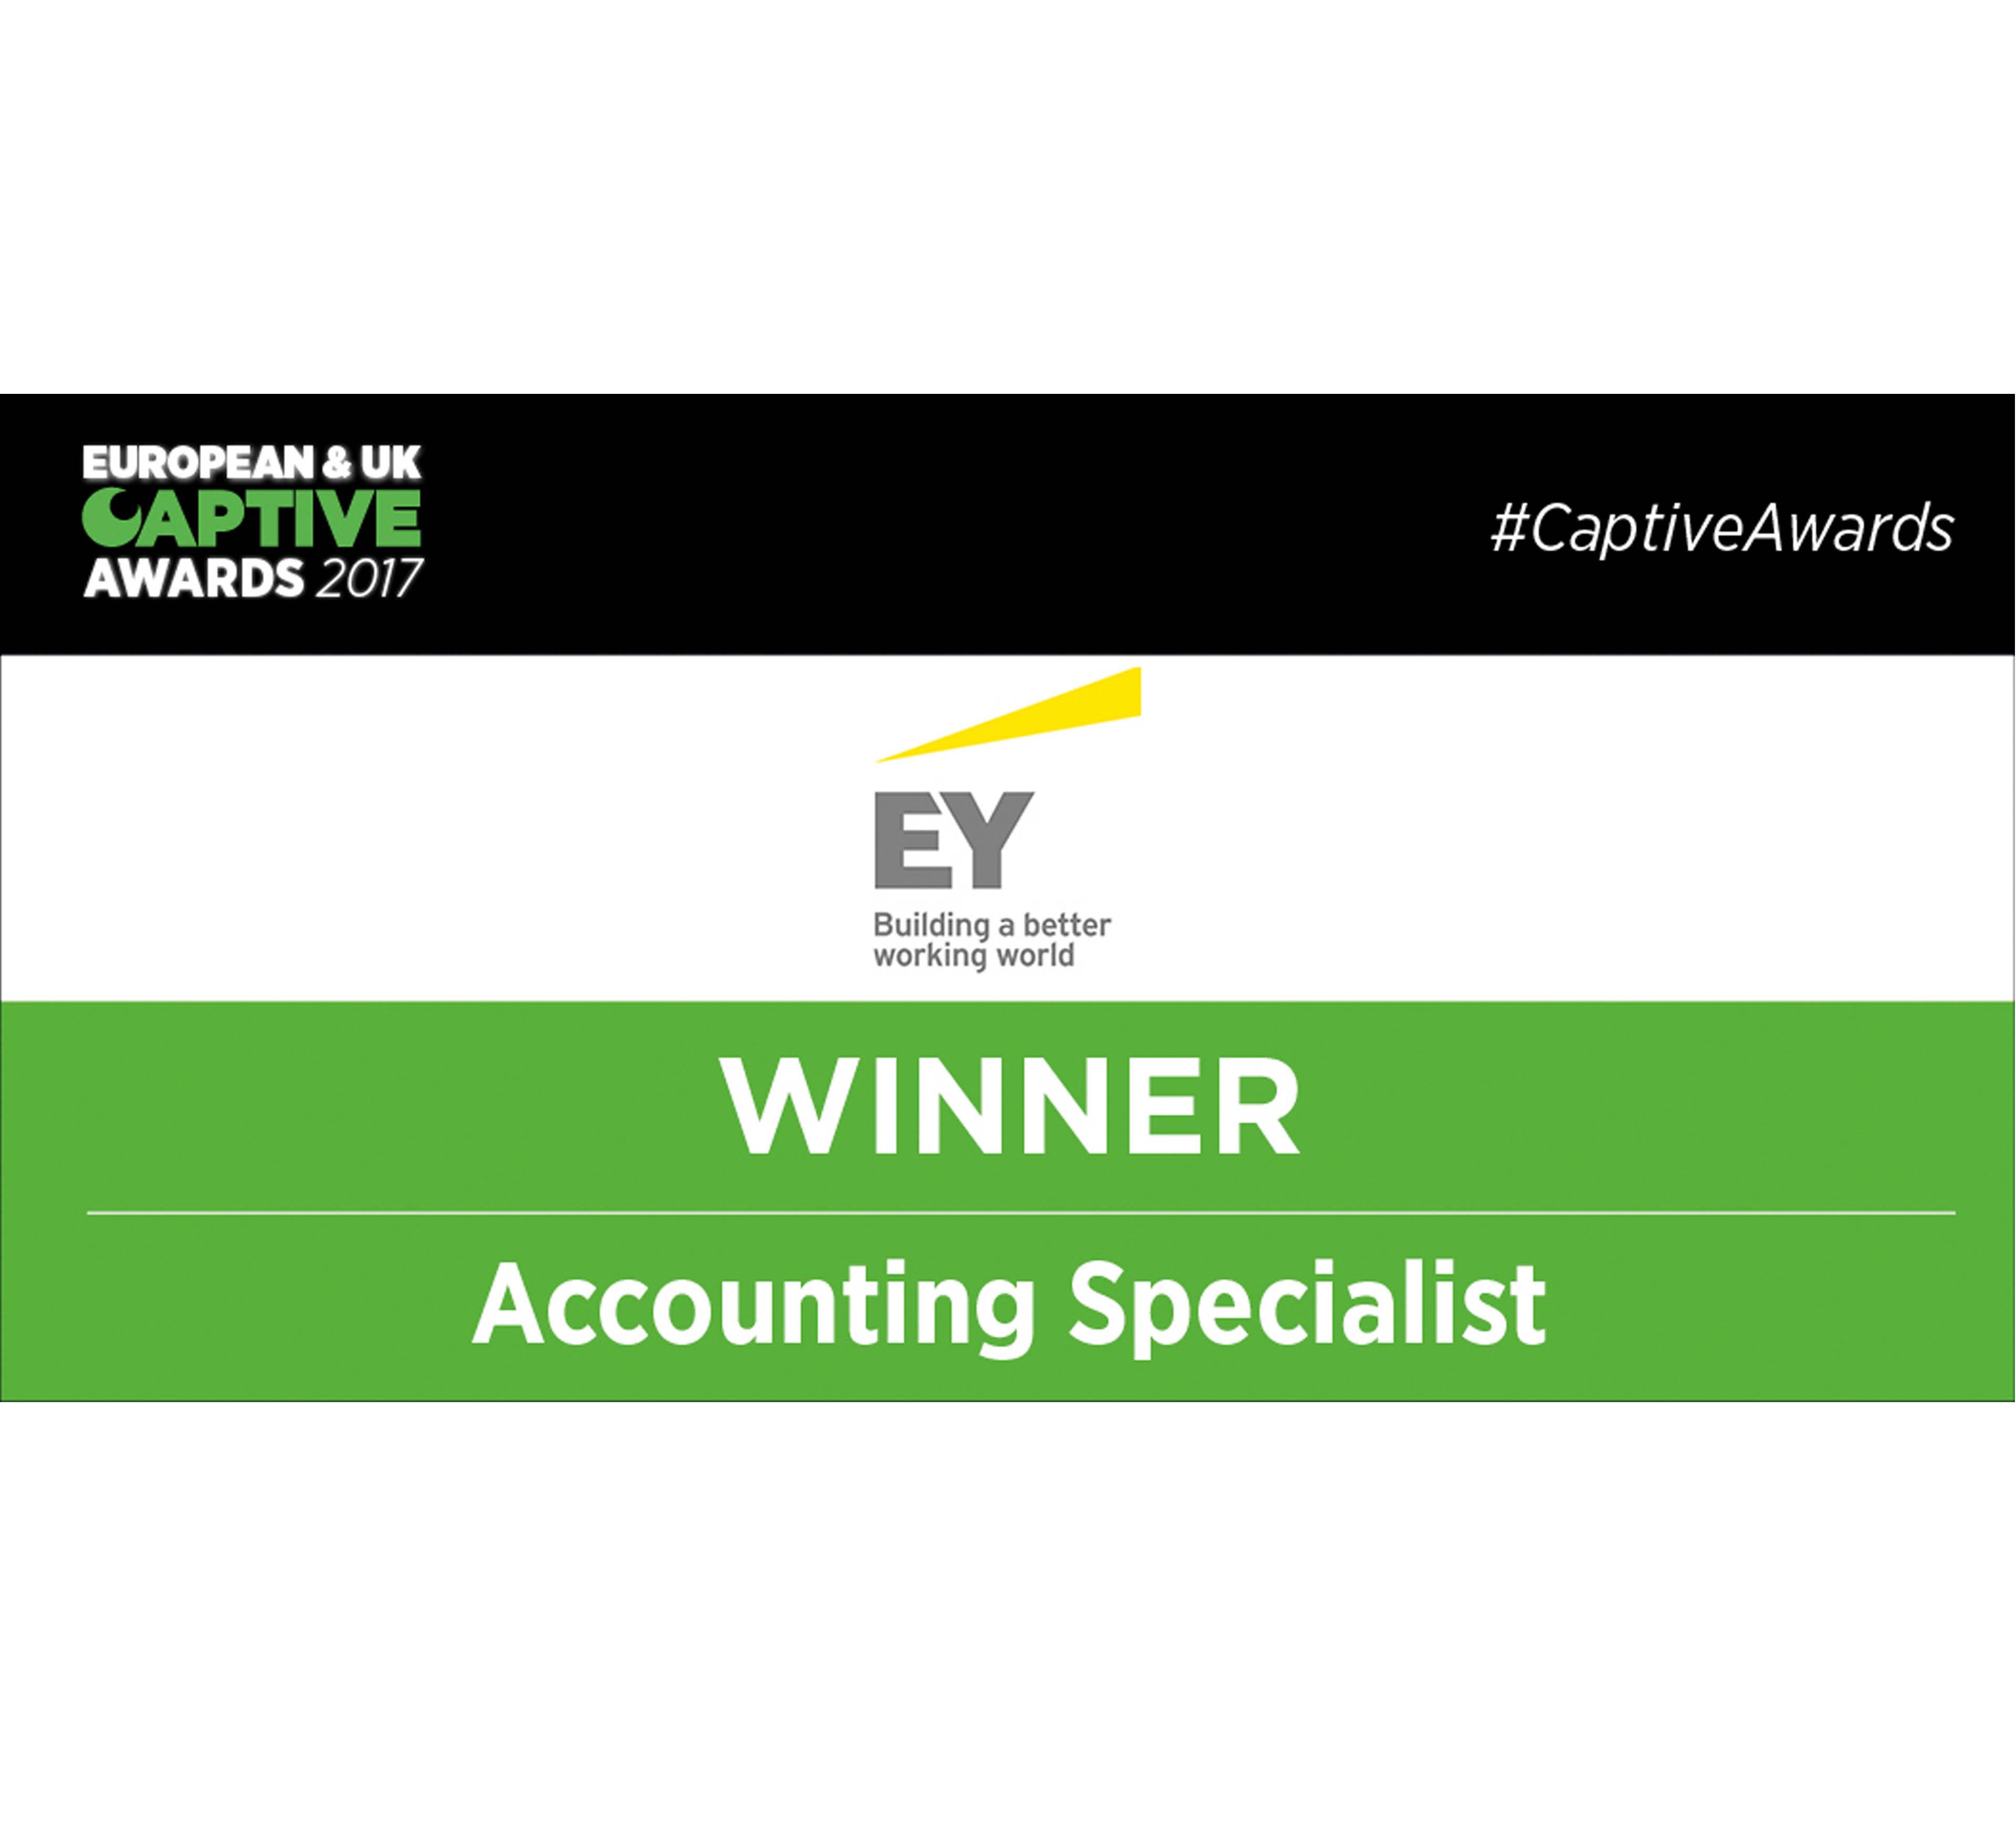 European & UK Captive Awards 2017 Winner Accounting Specialist EY